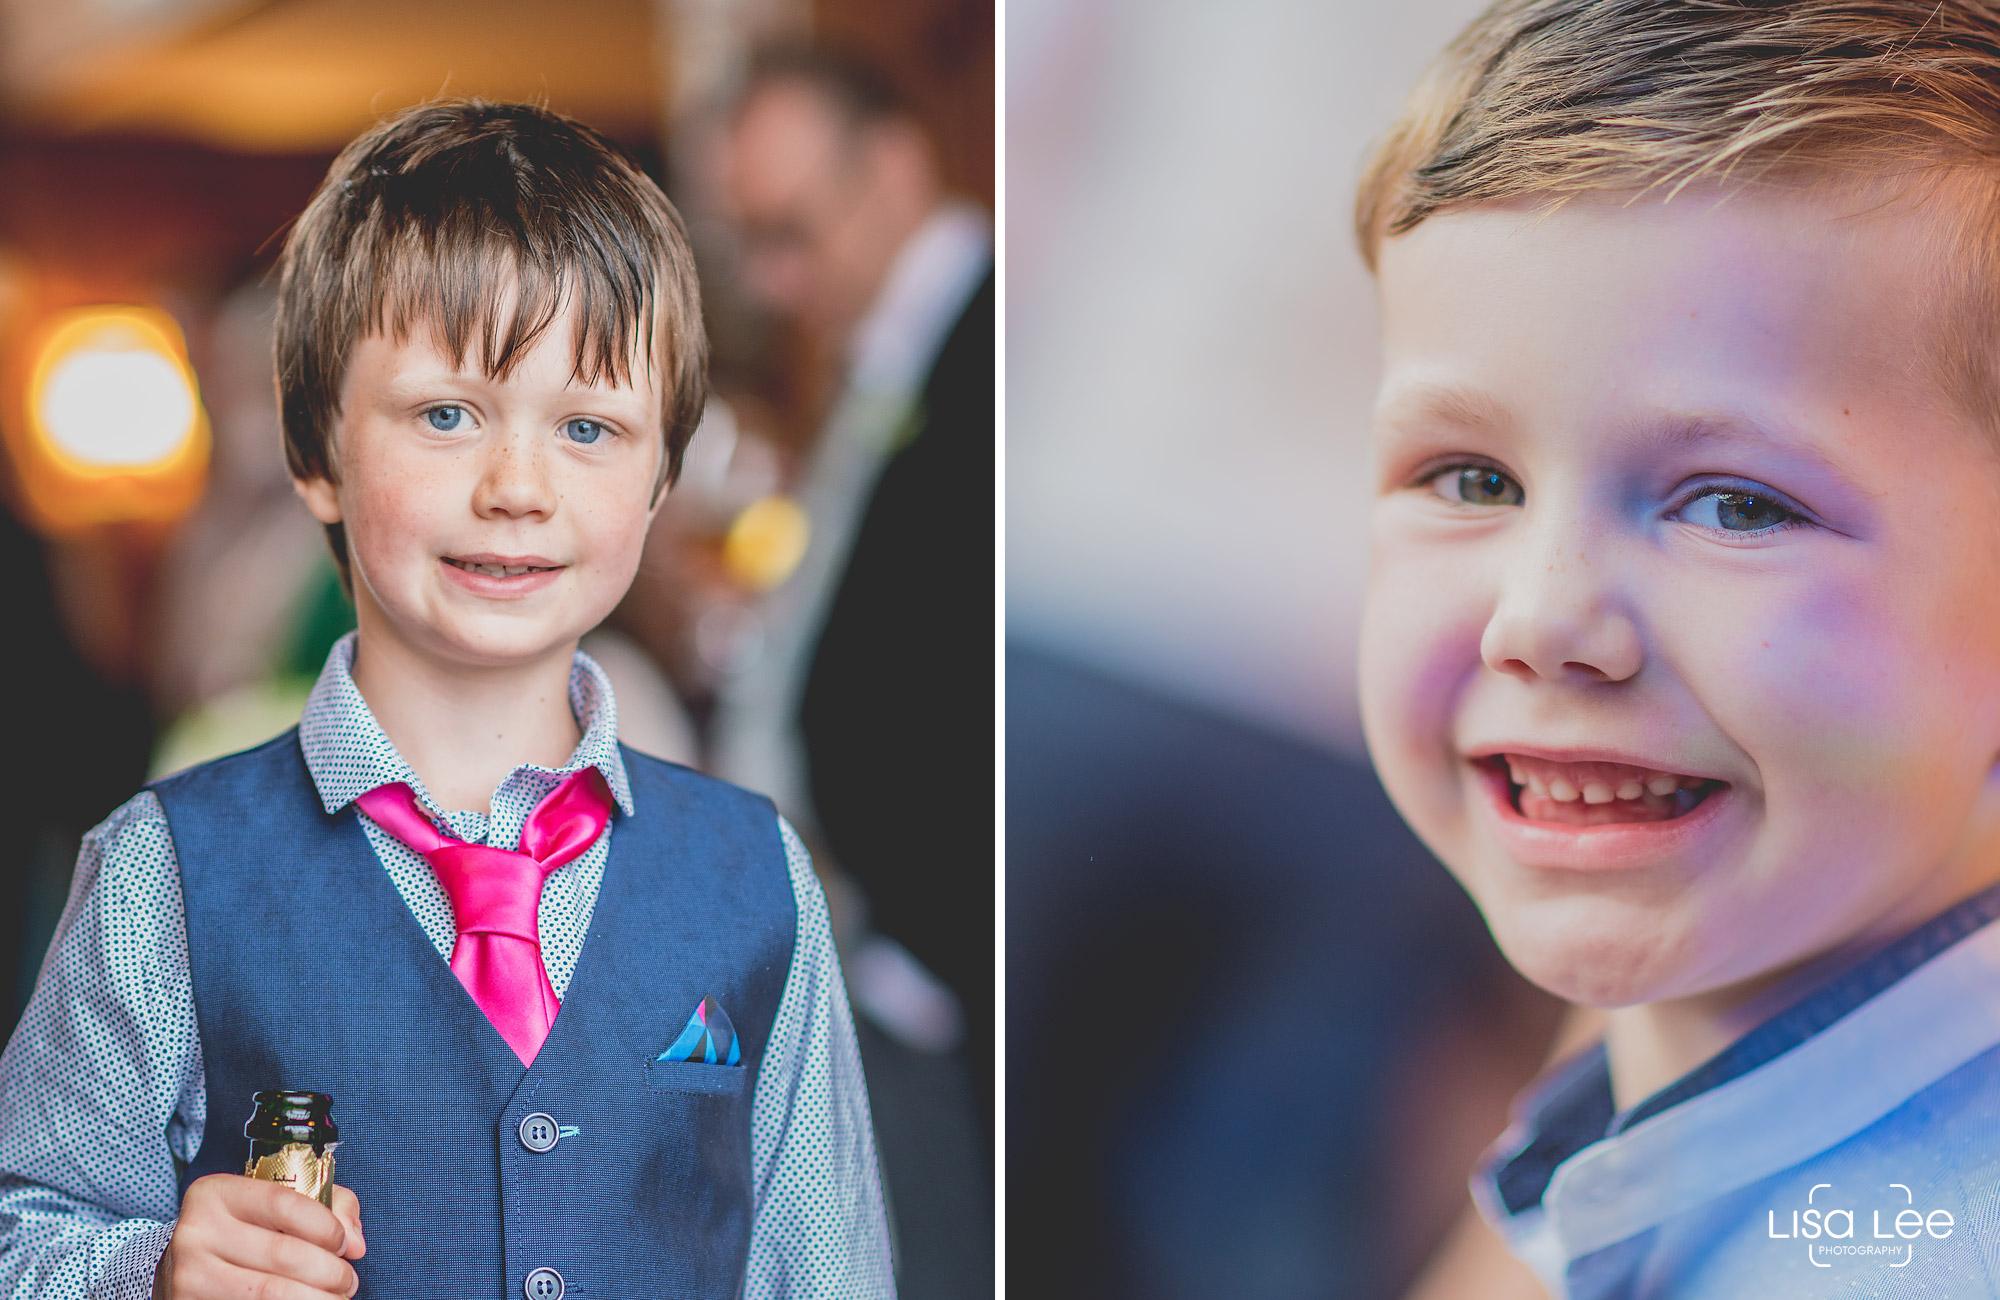 lisa-lee-wedding-photography-burton-kids2.jpg